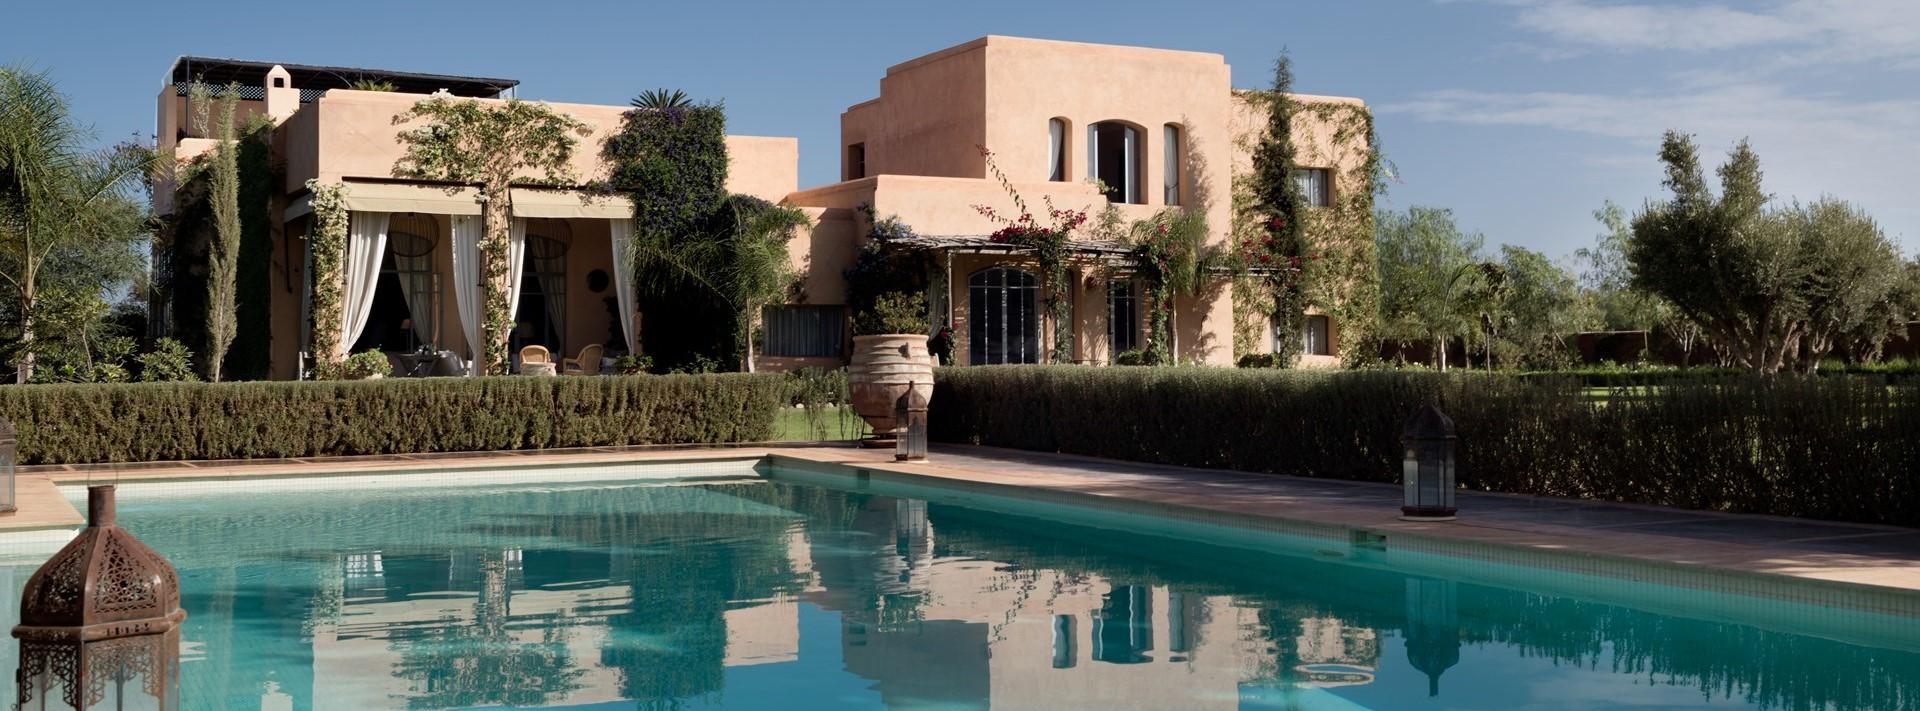 luxury-5-bedroom-villa-marrakech